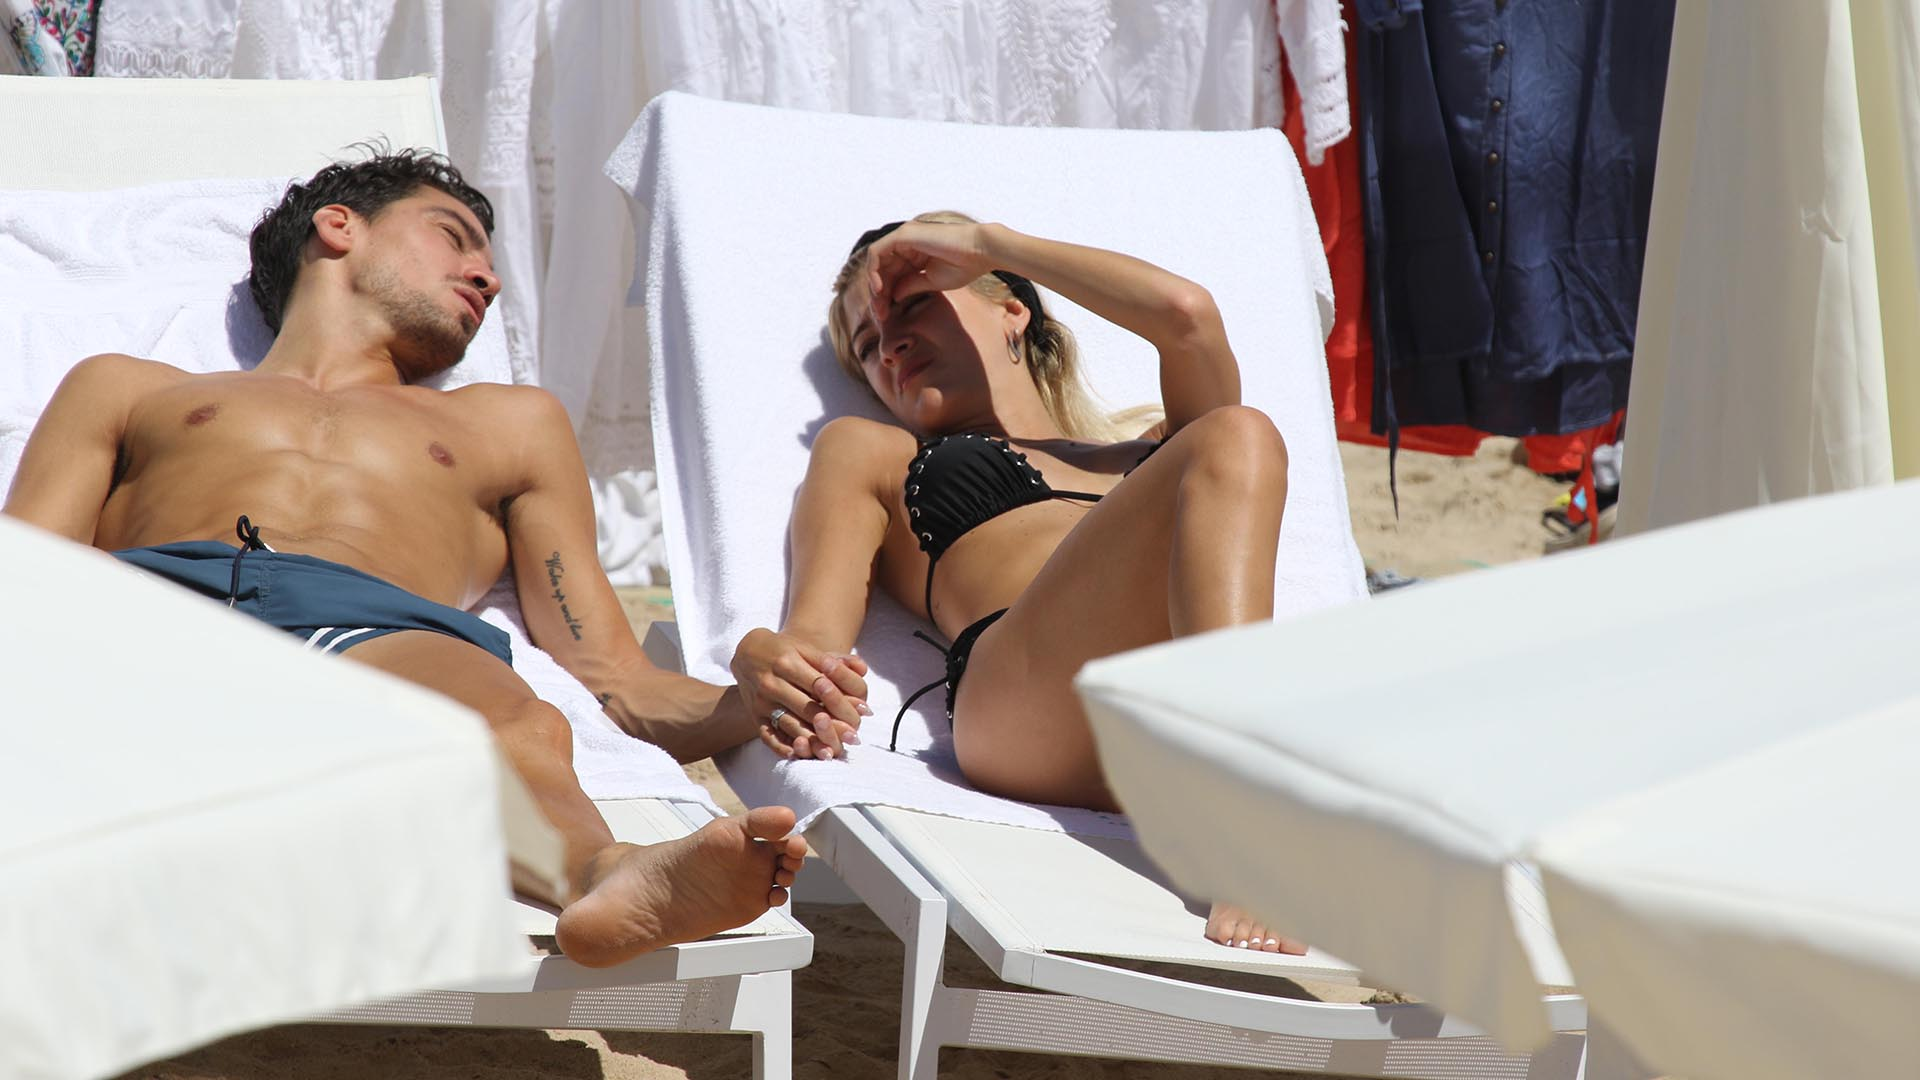 La pareja aprovechó para tomar sol y charlar